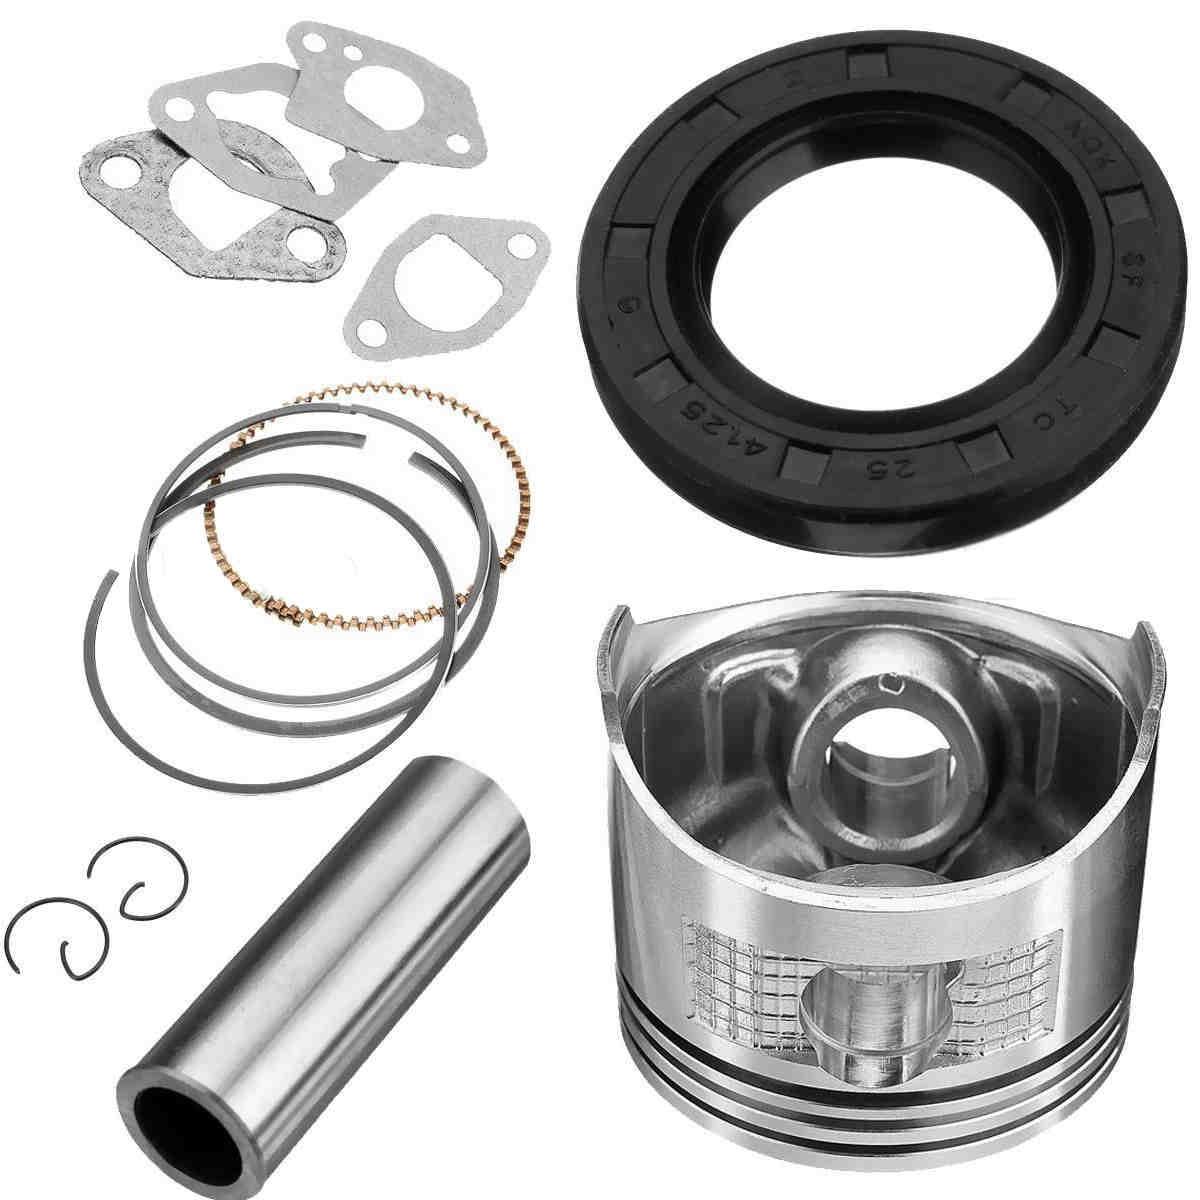 DWZ Rebuild Kit Set w/ Piston Ring + Gasket For GX160 GX200 5.5 6.5HP Engine New цена и фото